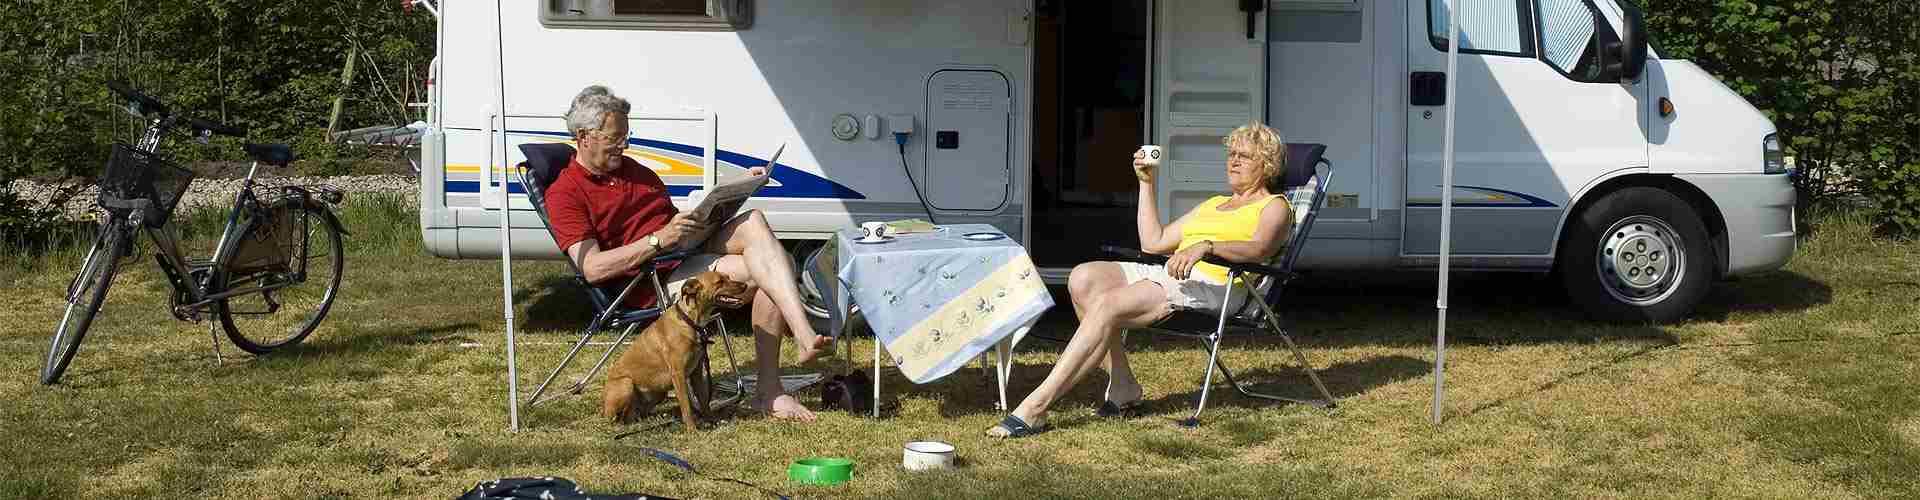 campings-bungalows